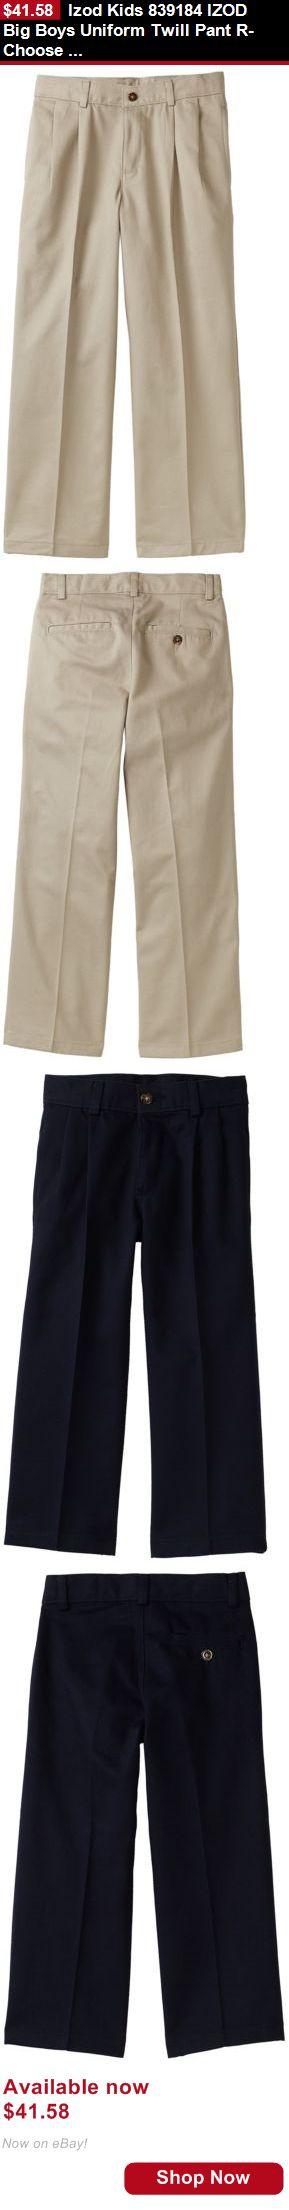 Boys uniforms: Izod Kids 839184 Izod Big Boys Uniform Twill Pant R- Choose Sz/Color. BUY IT NOW ONLY: $41.58